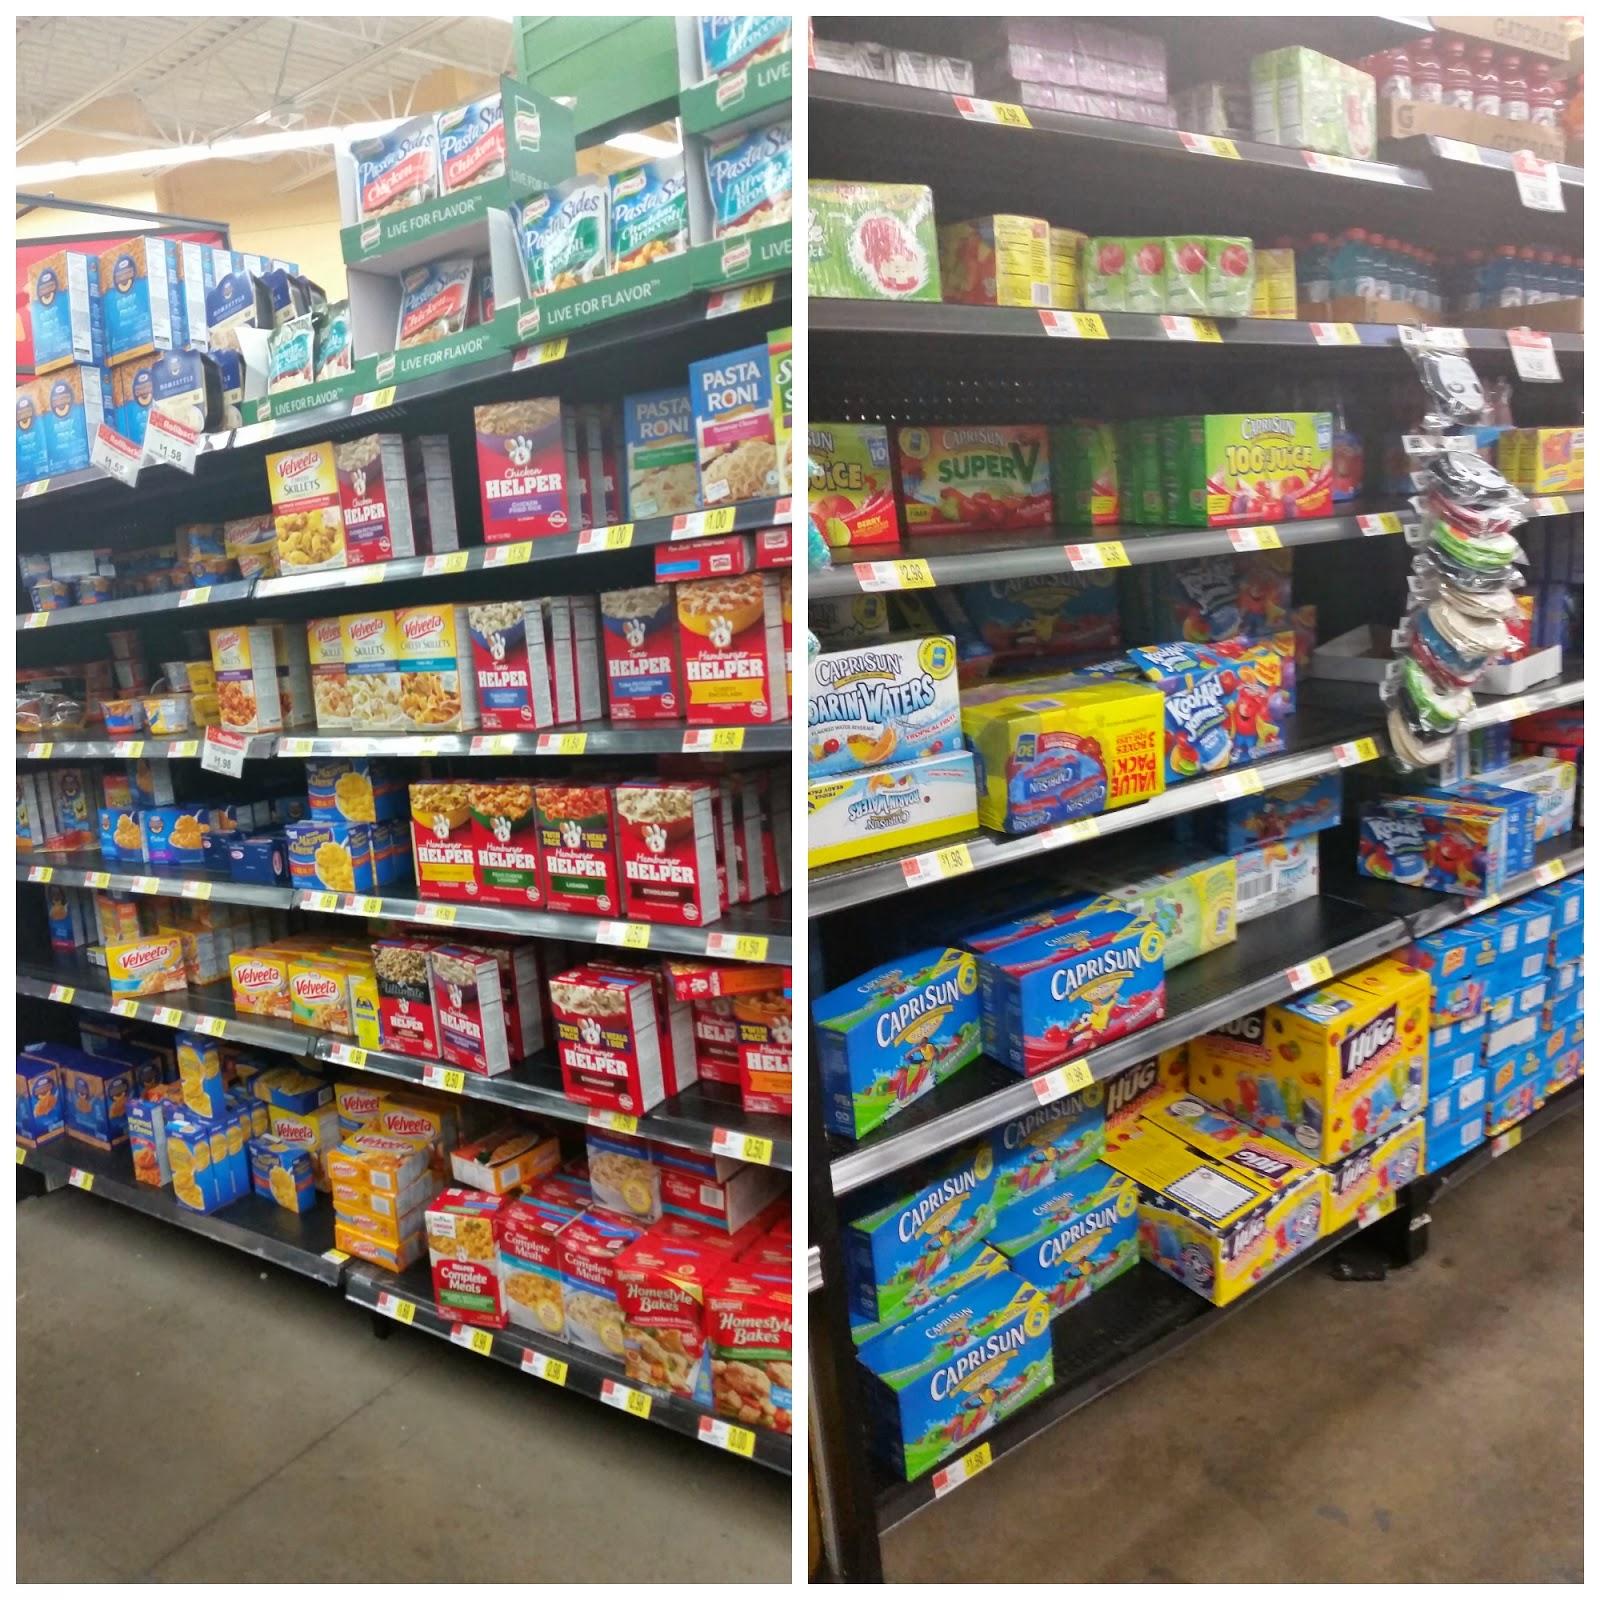 Kraft Mac & Cheese and Capri Sun: Available at Walmart #GolazoKraft #Shop